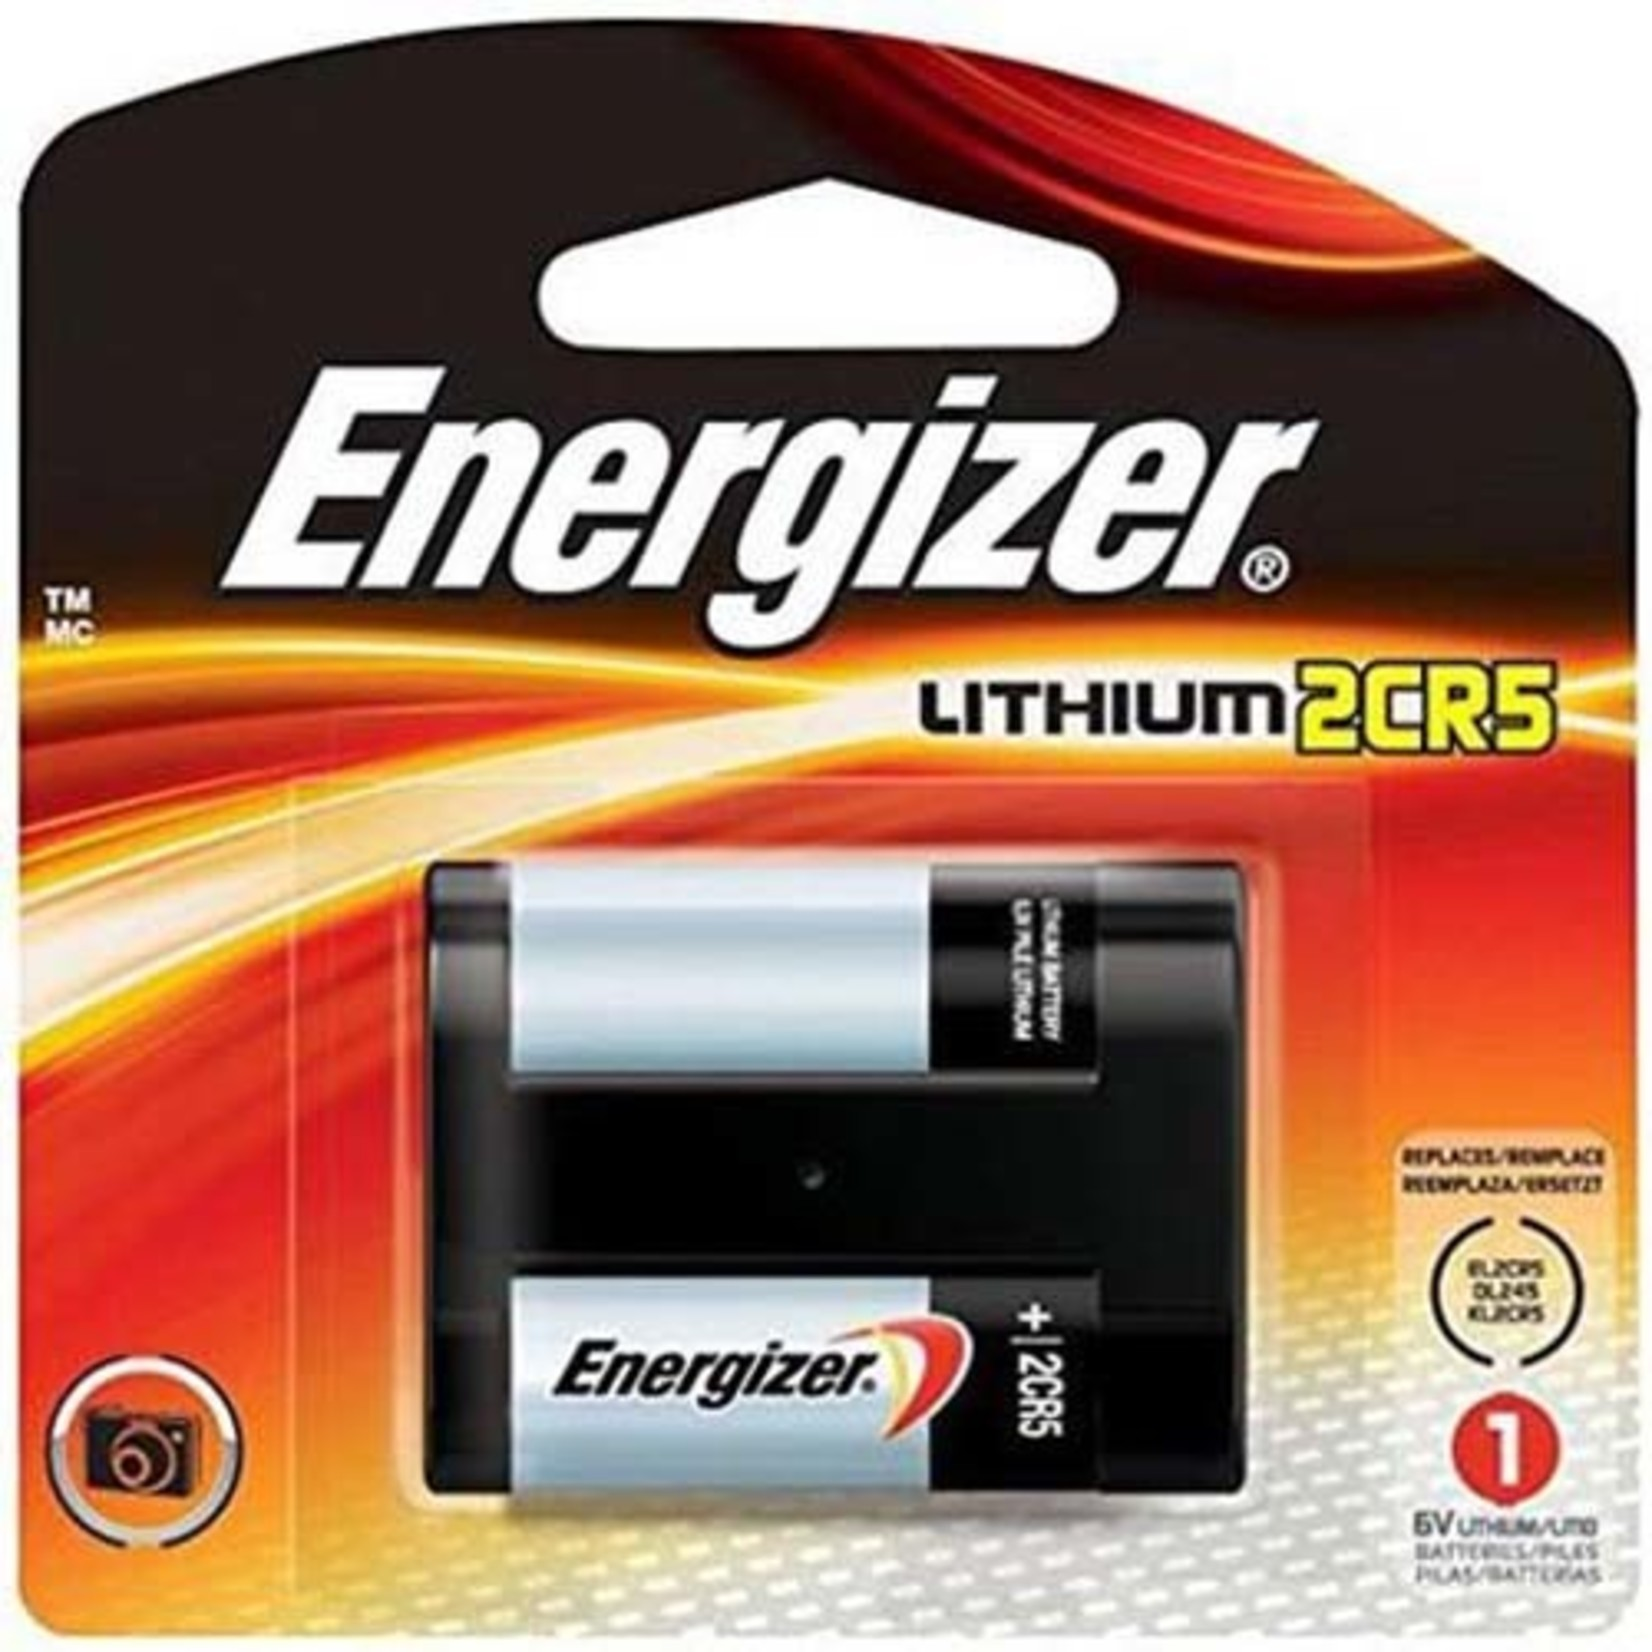 Energizer Energizer 2CR5 6 volt lithium